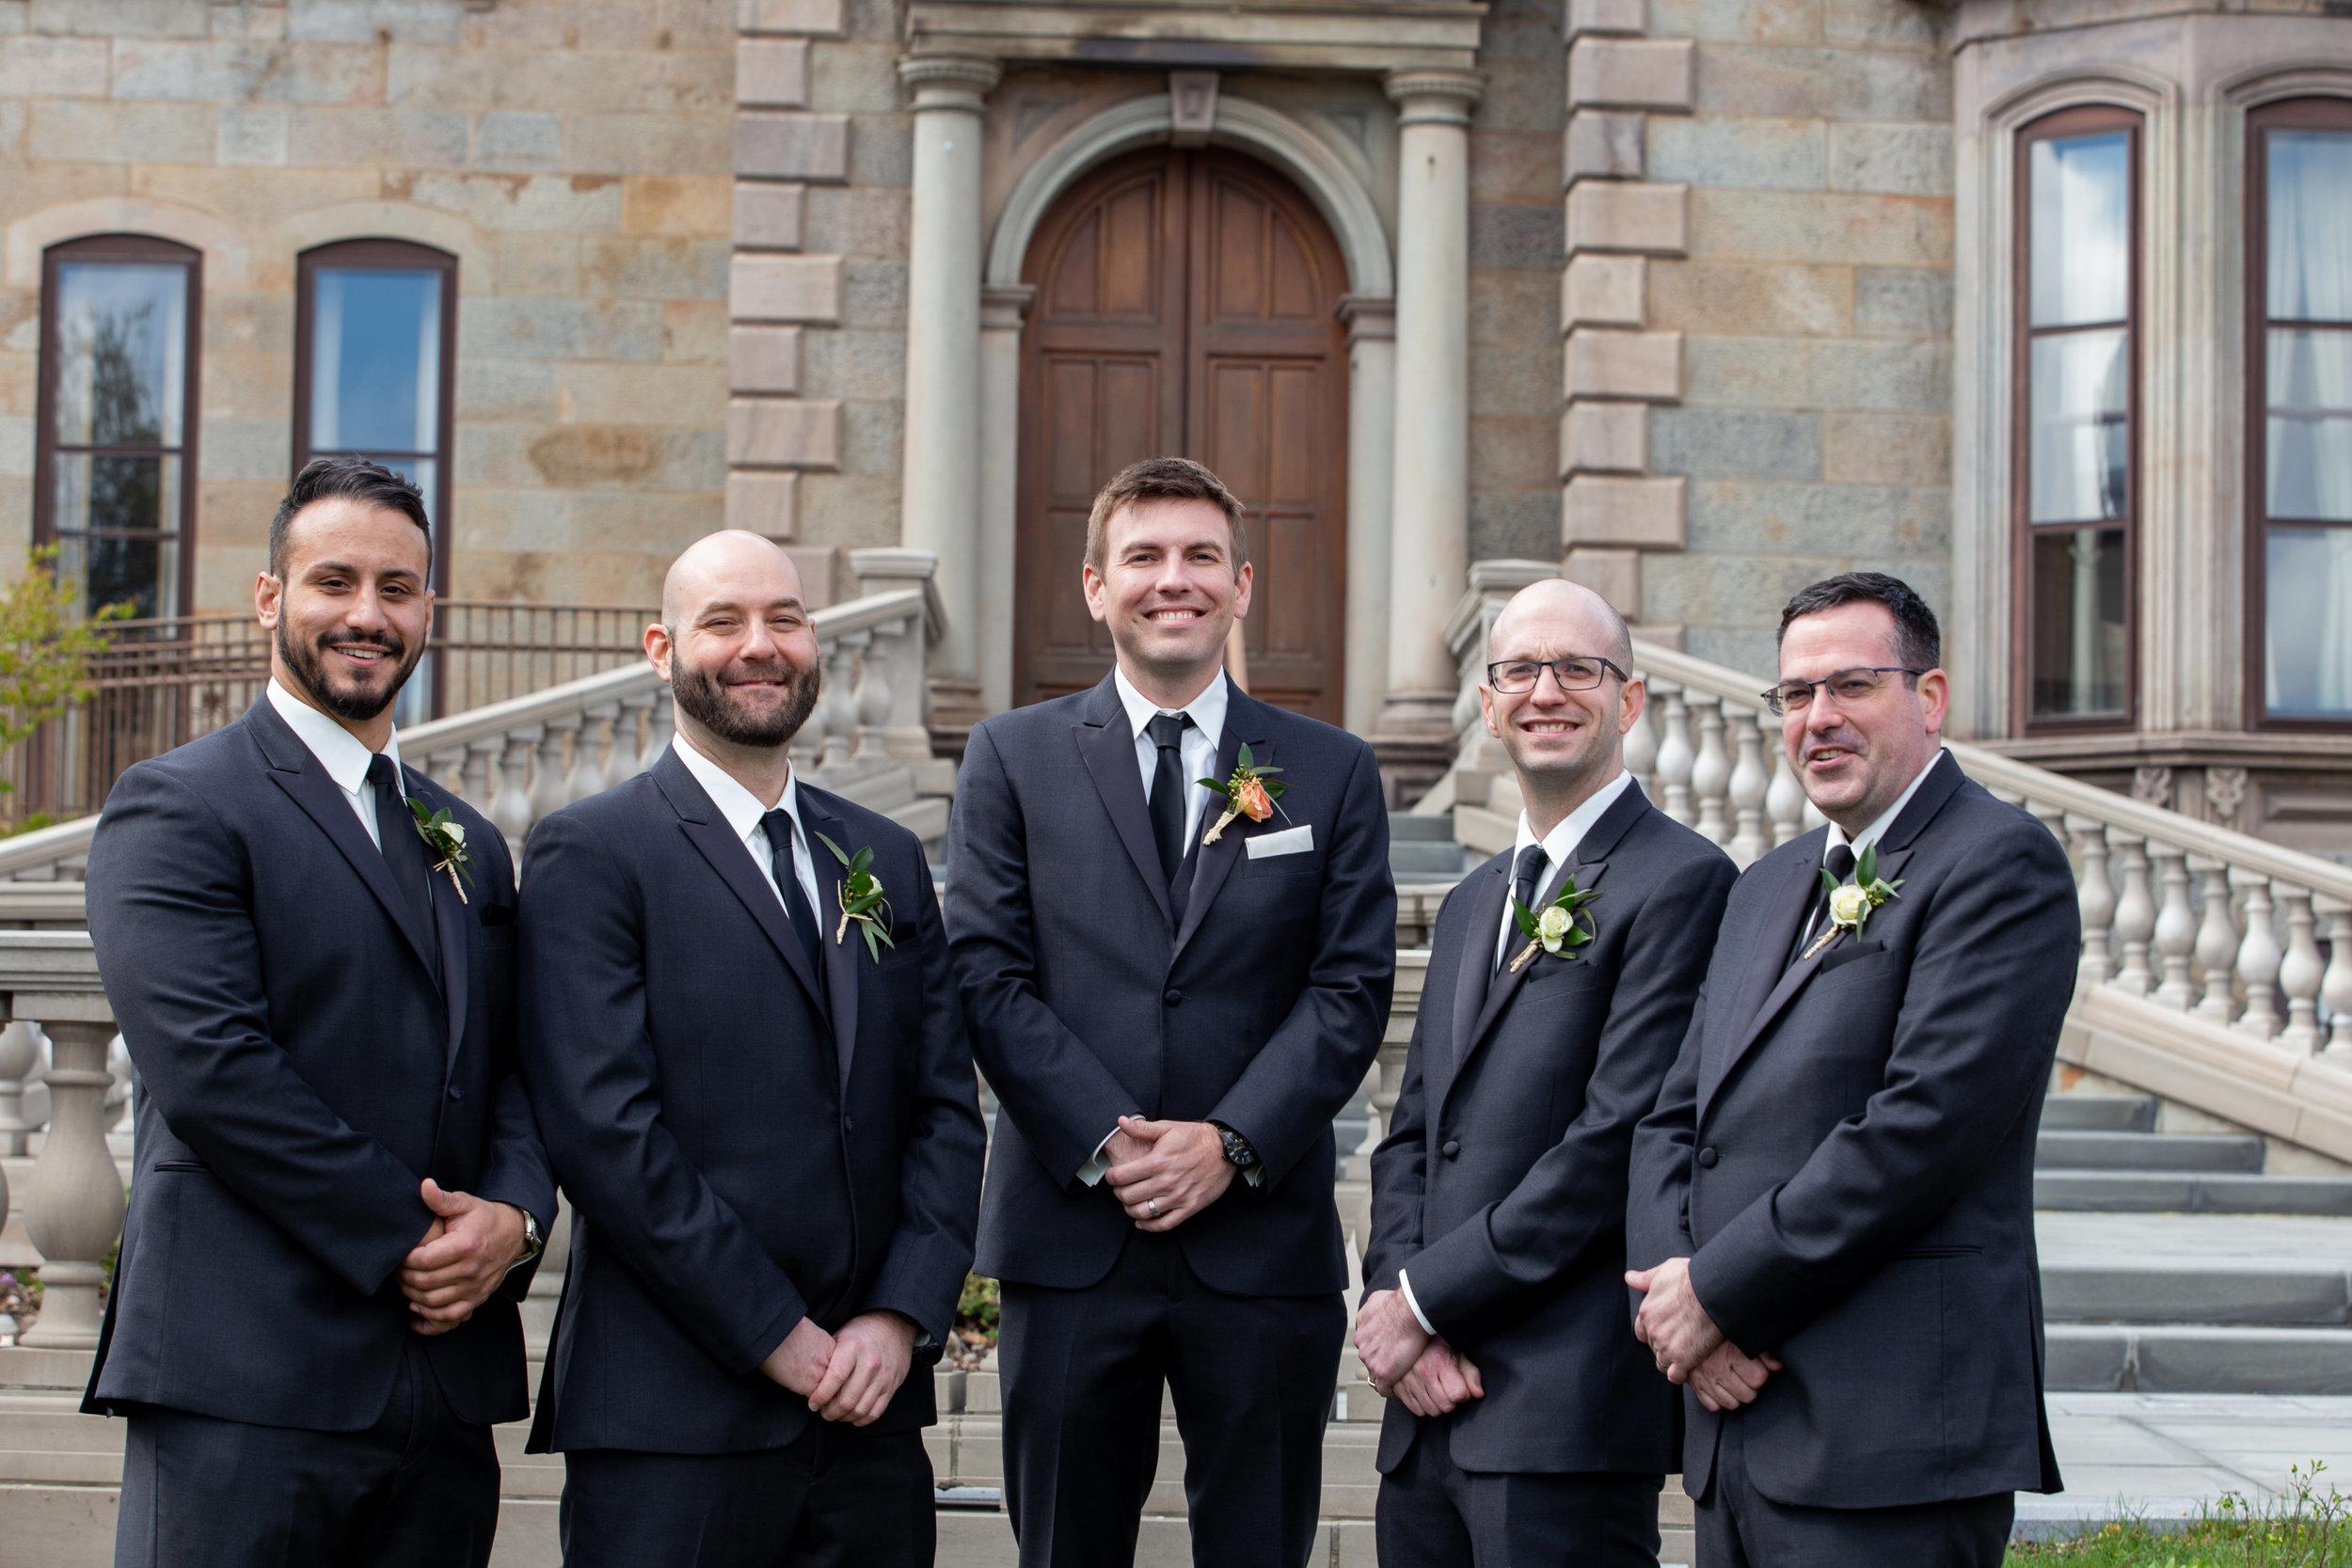 radisson-scranton-wedding-photography0014.jpg